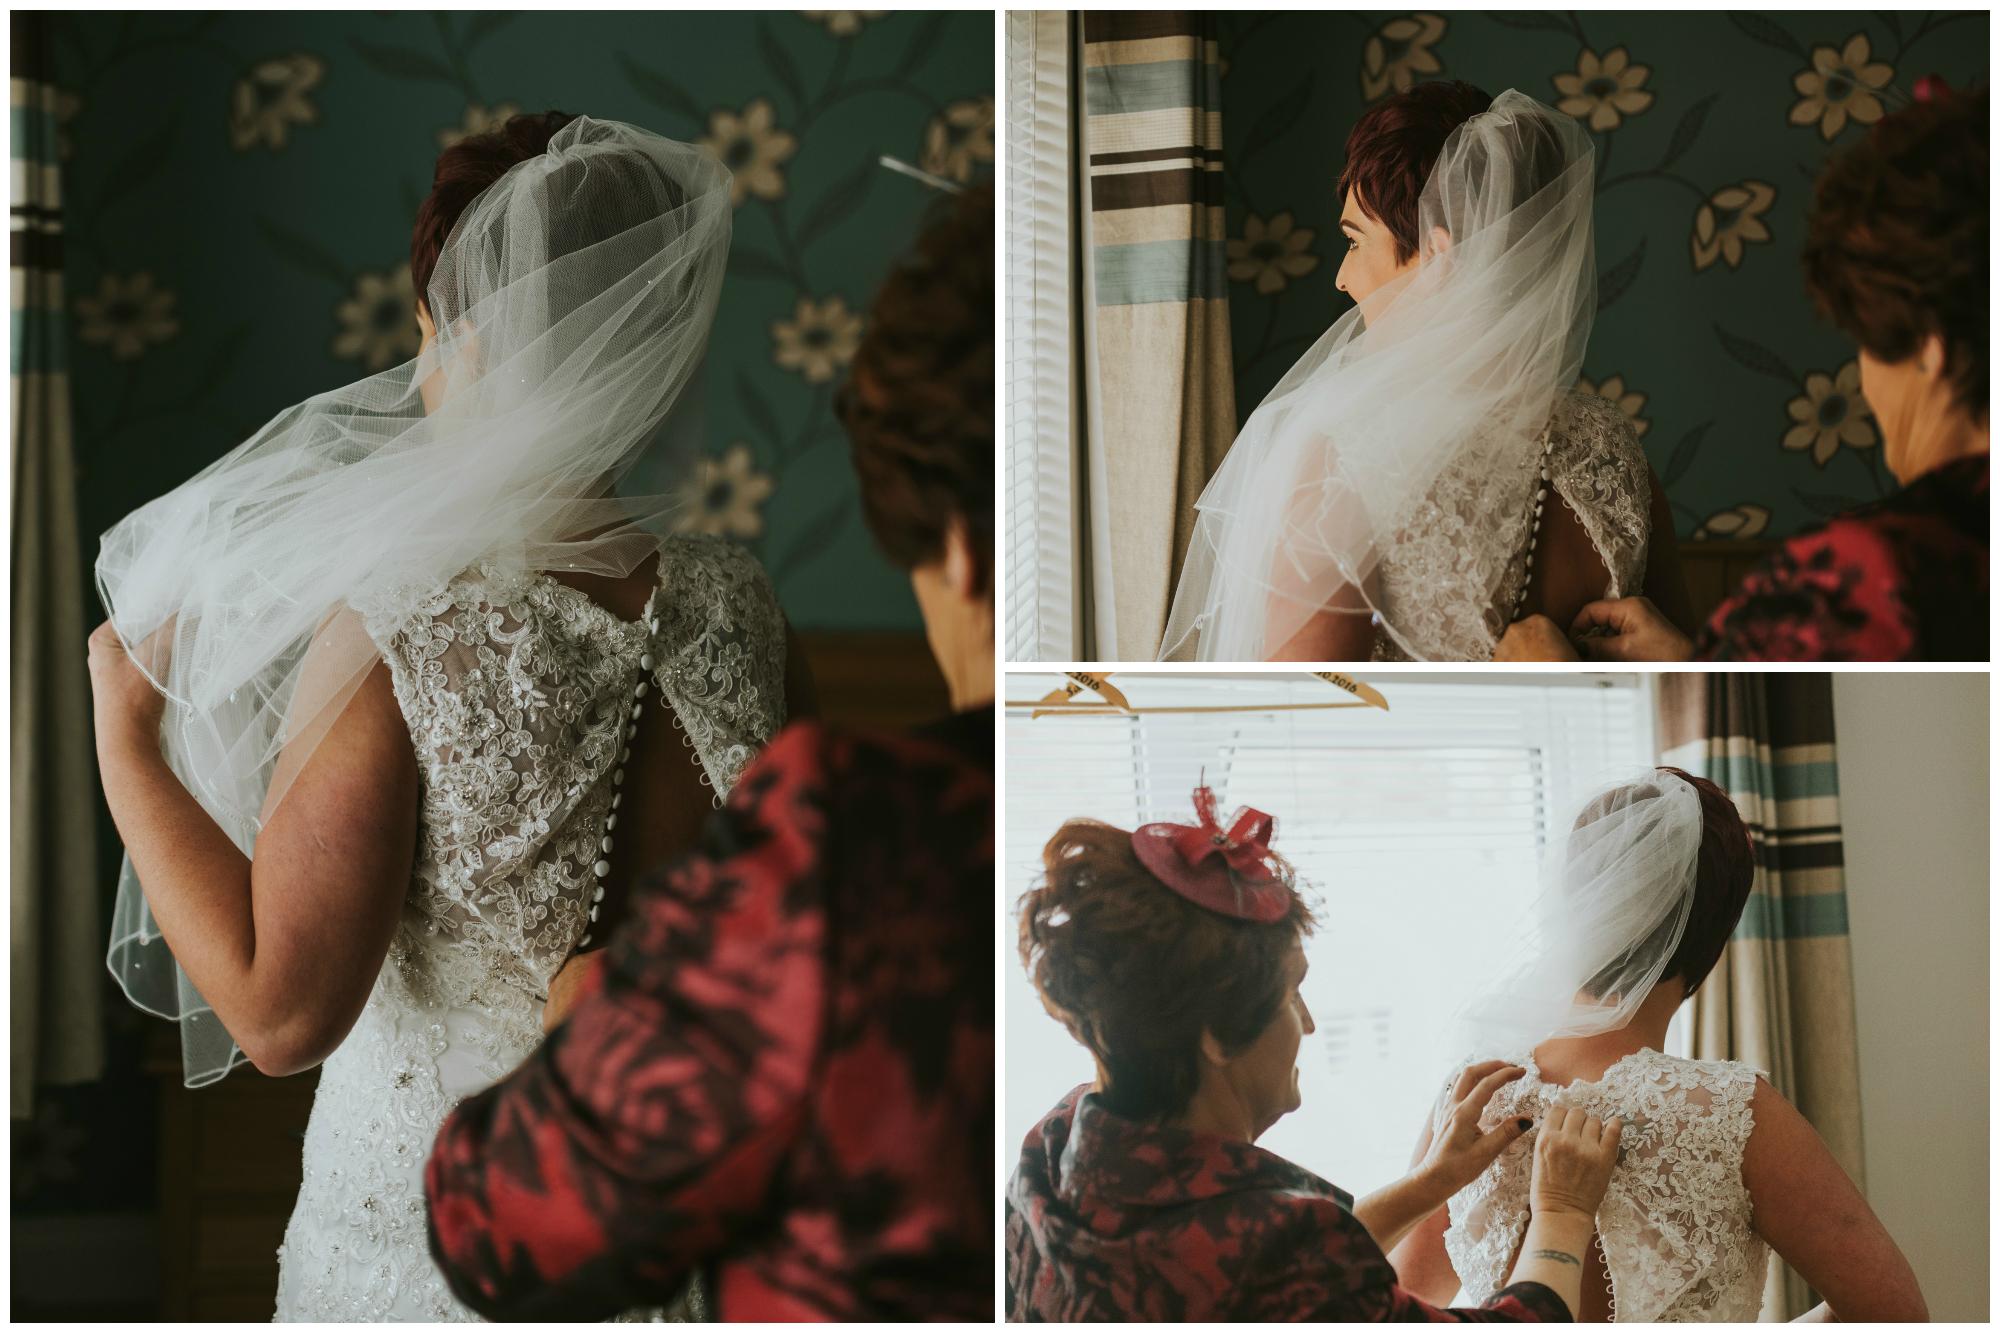 Limavady Wedding Pure Photo N.I bride putting dress on